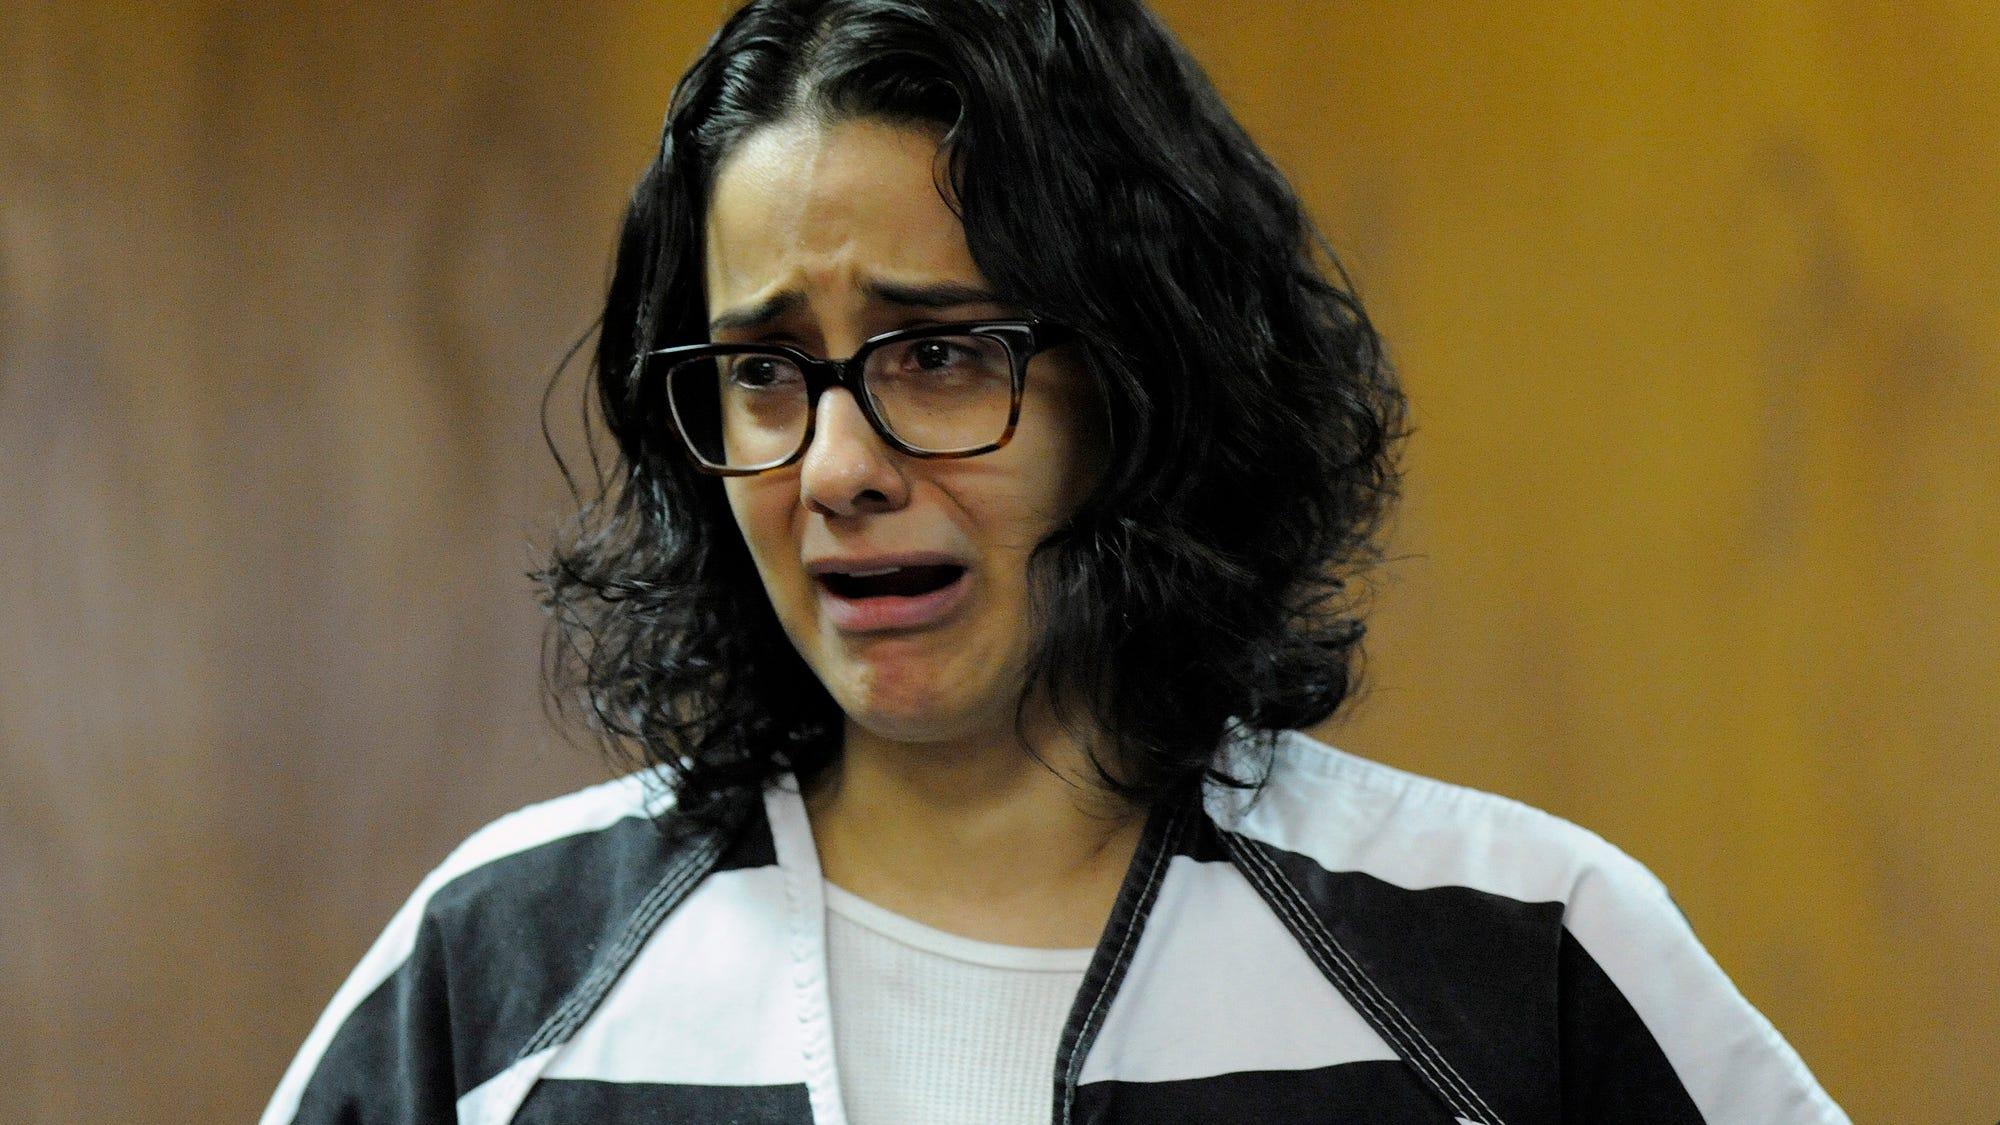 GABRIELA CORTEZ: FORMER CALIFORNIA TEACHER PLEADS GUILTY